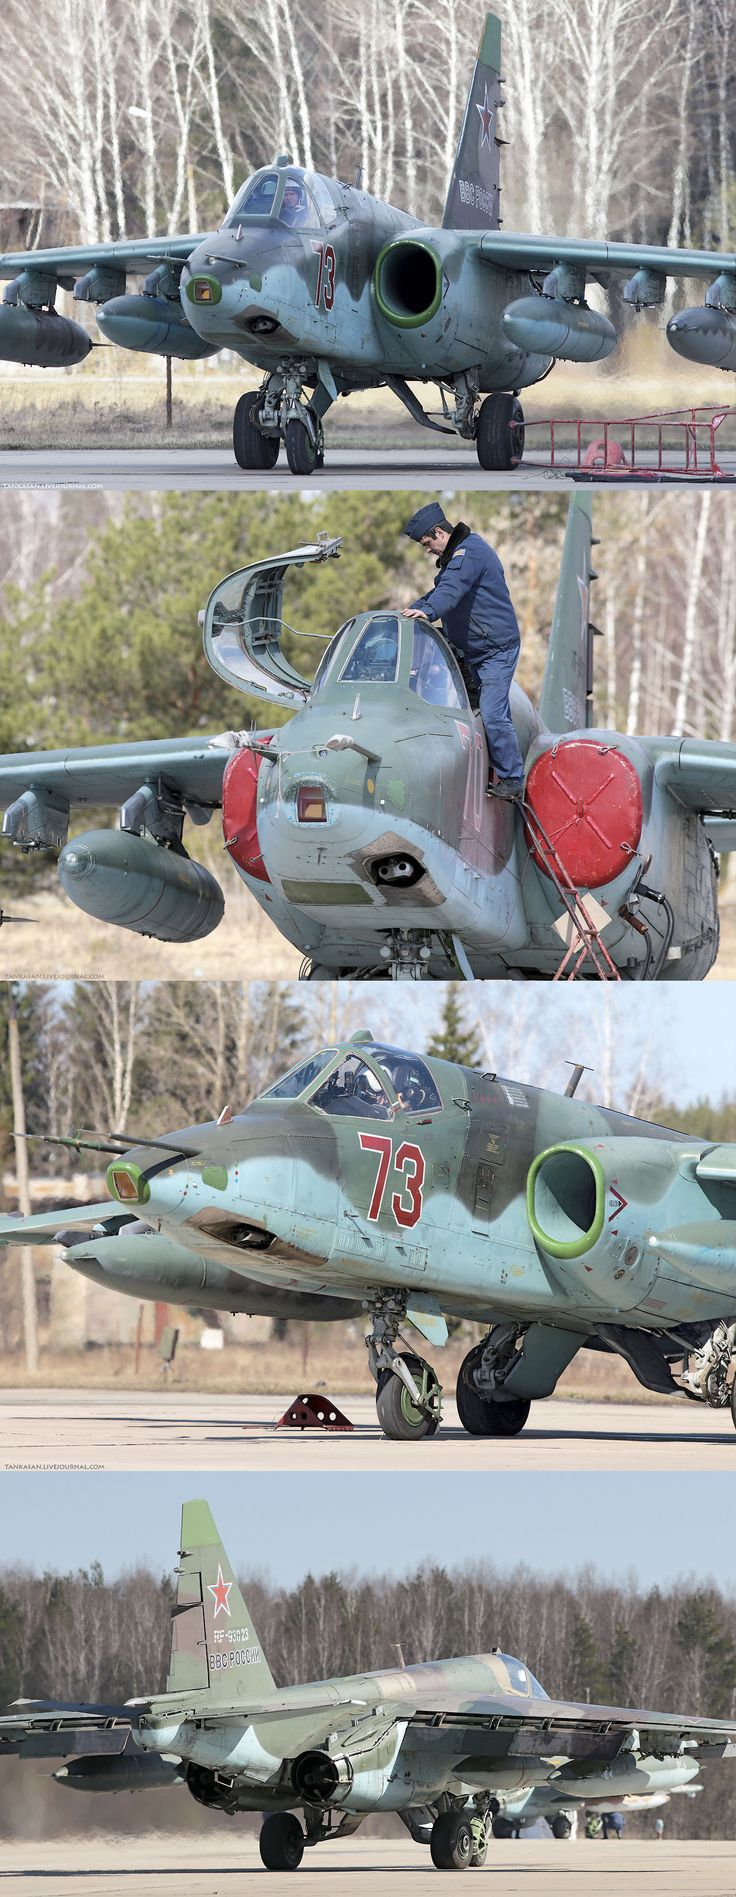 Su-25 https://sites.google.com/site/katrinakaifirihakurubone TEAM Build System Builds YOUR List! Grab YOUR OWN Prospecting System NOW! https://sites.google.com/site/katrinakaifirihakurubone